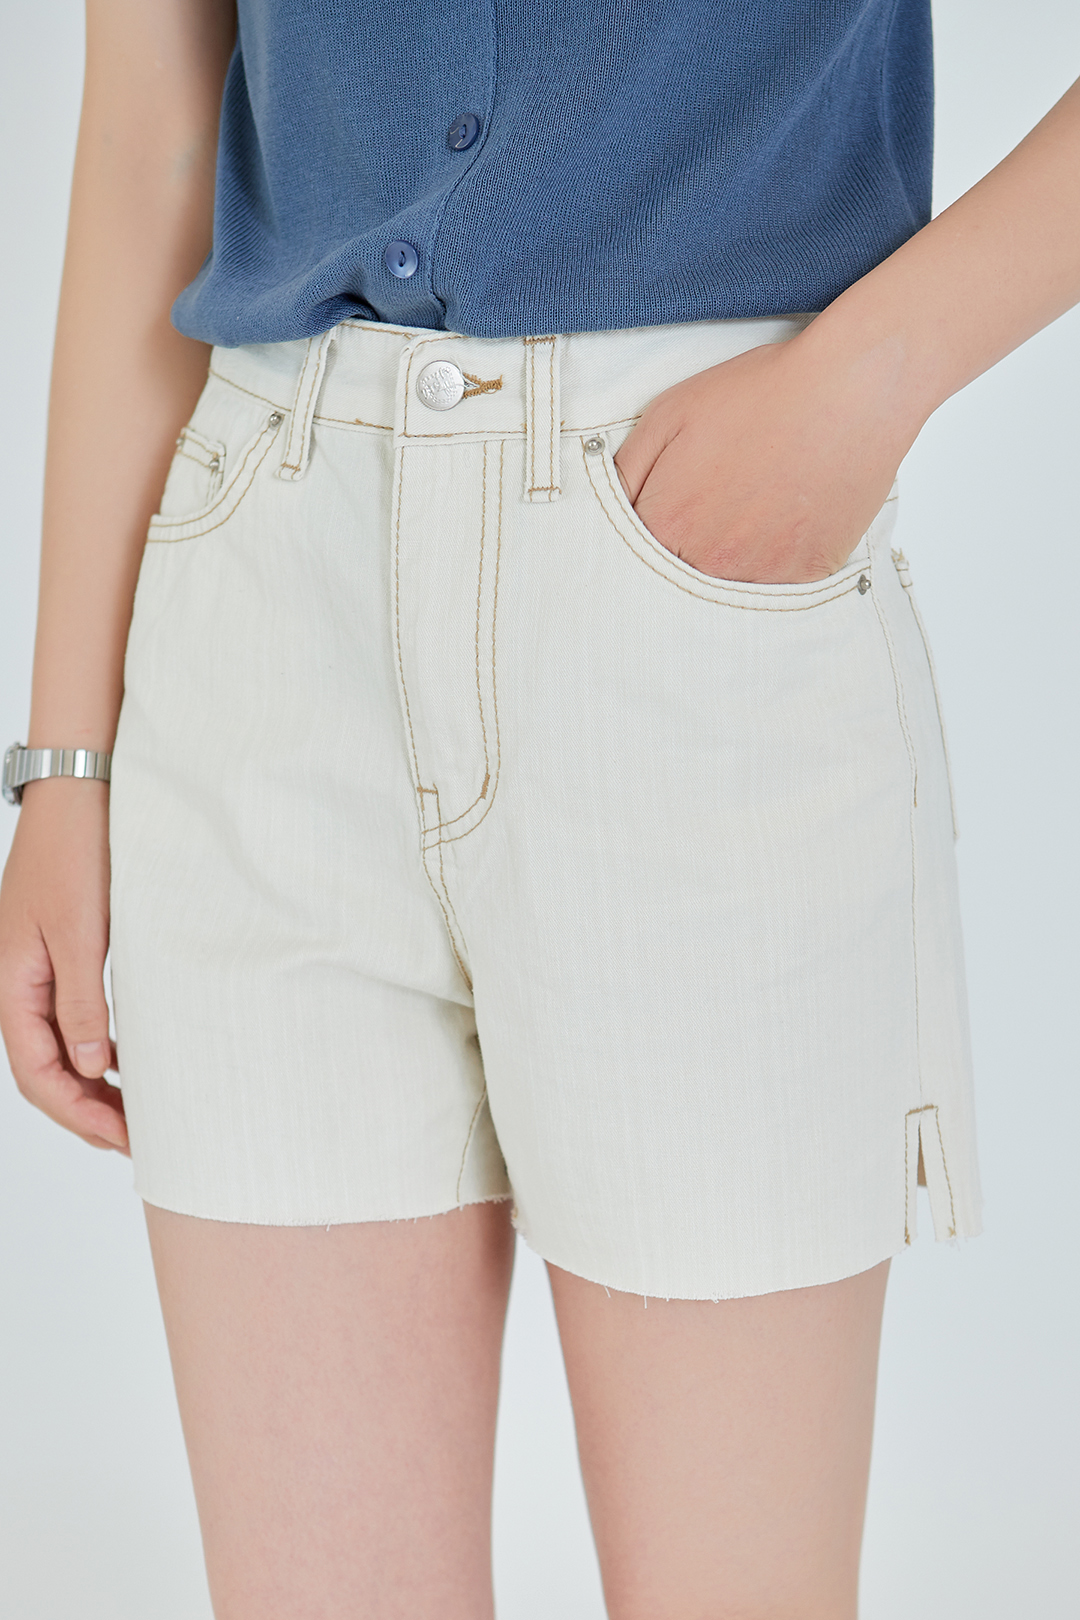 ESSAYRaw Hem Contrast Stitch Shorts